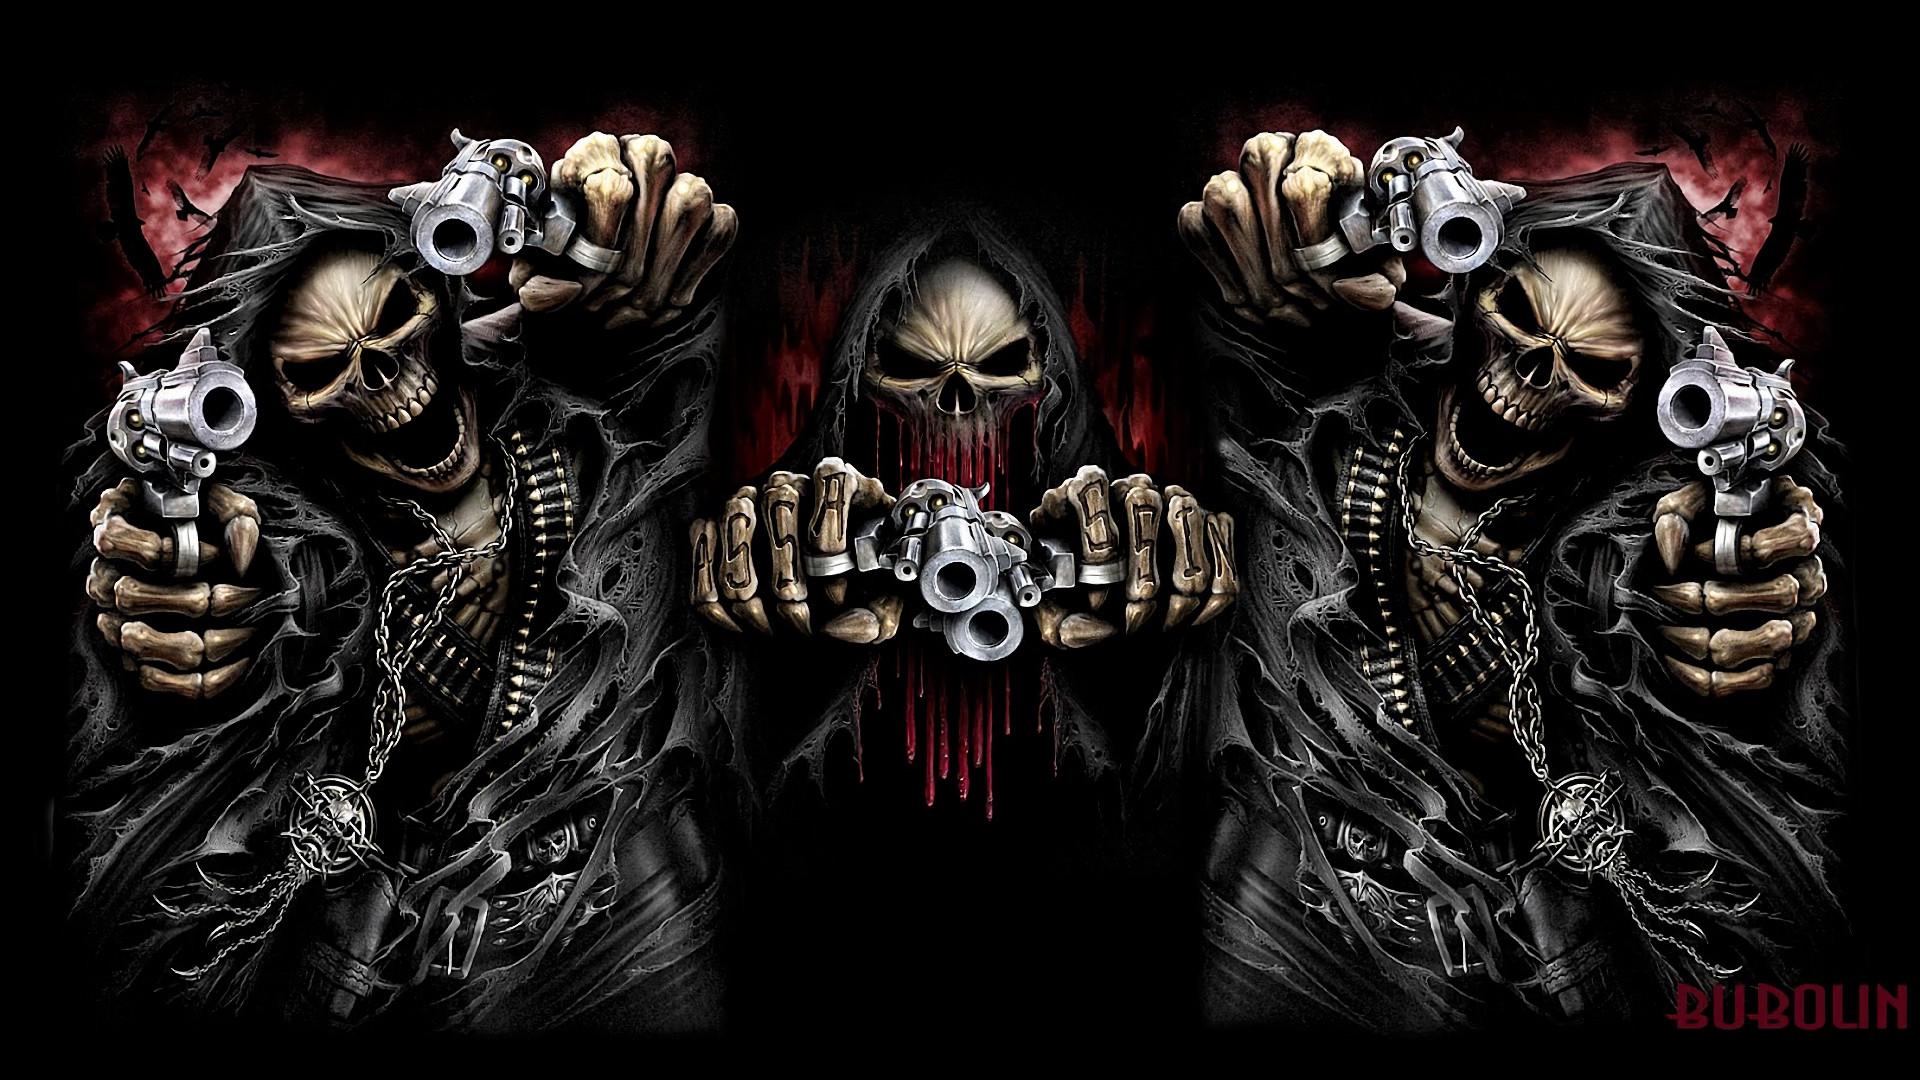 Halloween skeleton wallpaper 65 images - Skeleton wallpaper ...